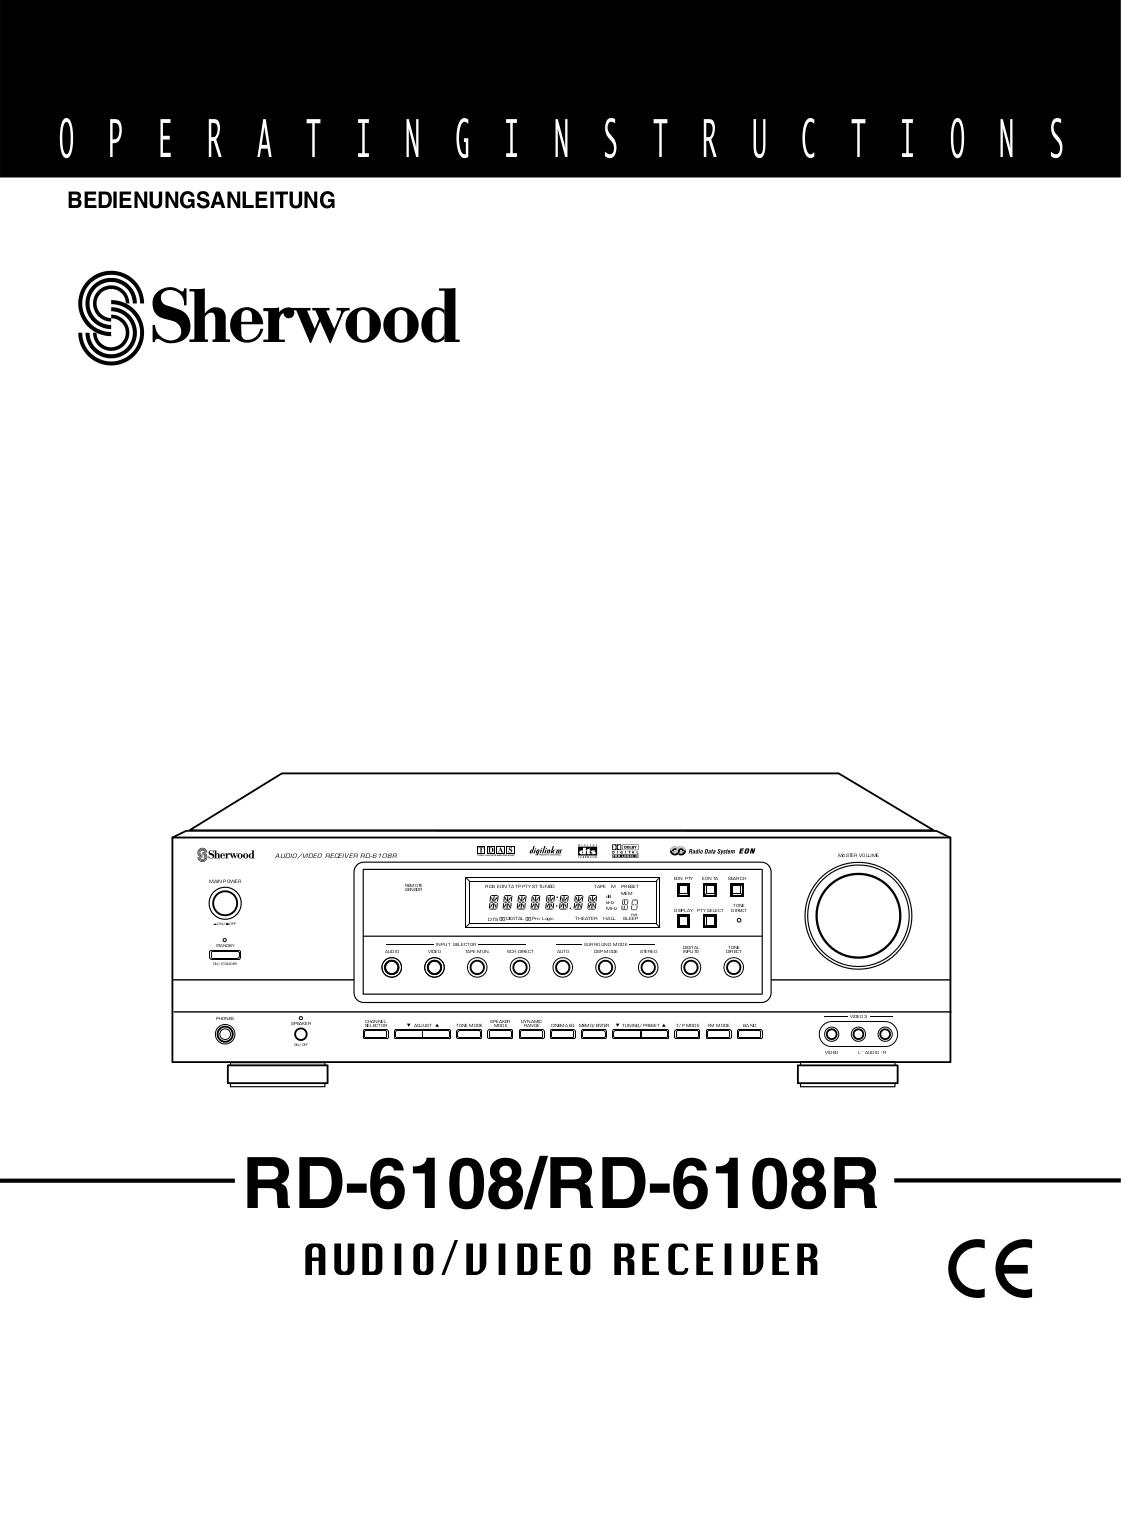 Download free pdf for Sherwood RD-6108 Receiver manual